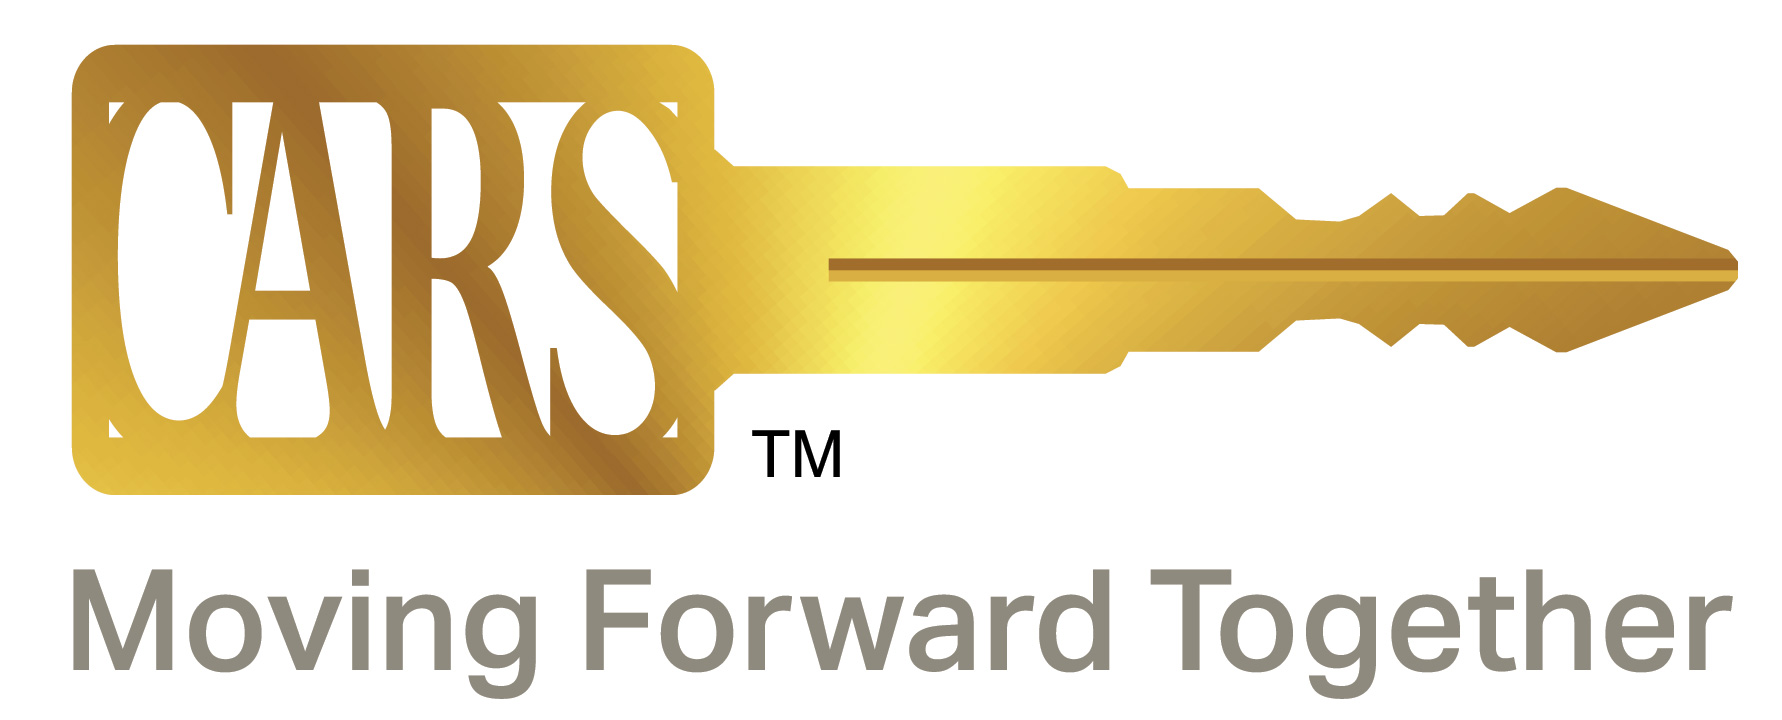 Logo of CARS, Inc.